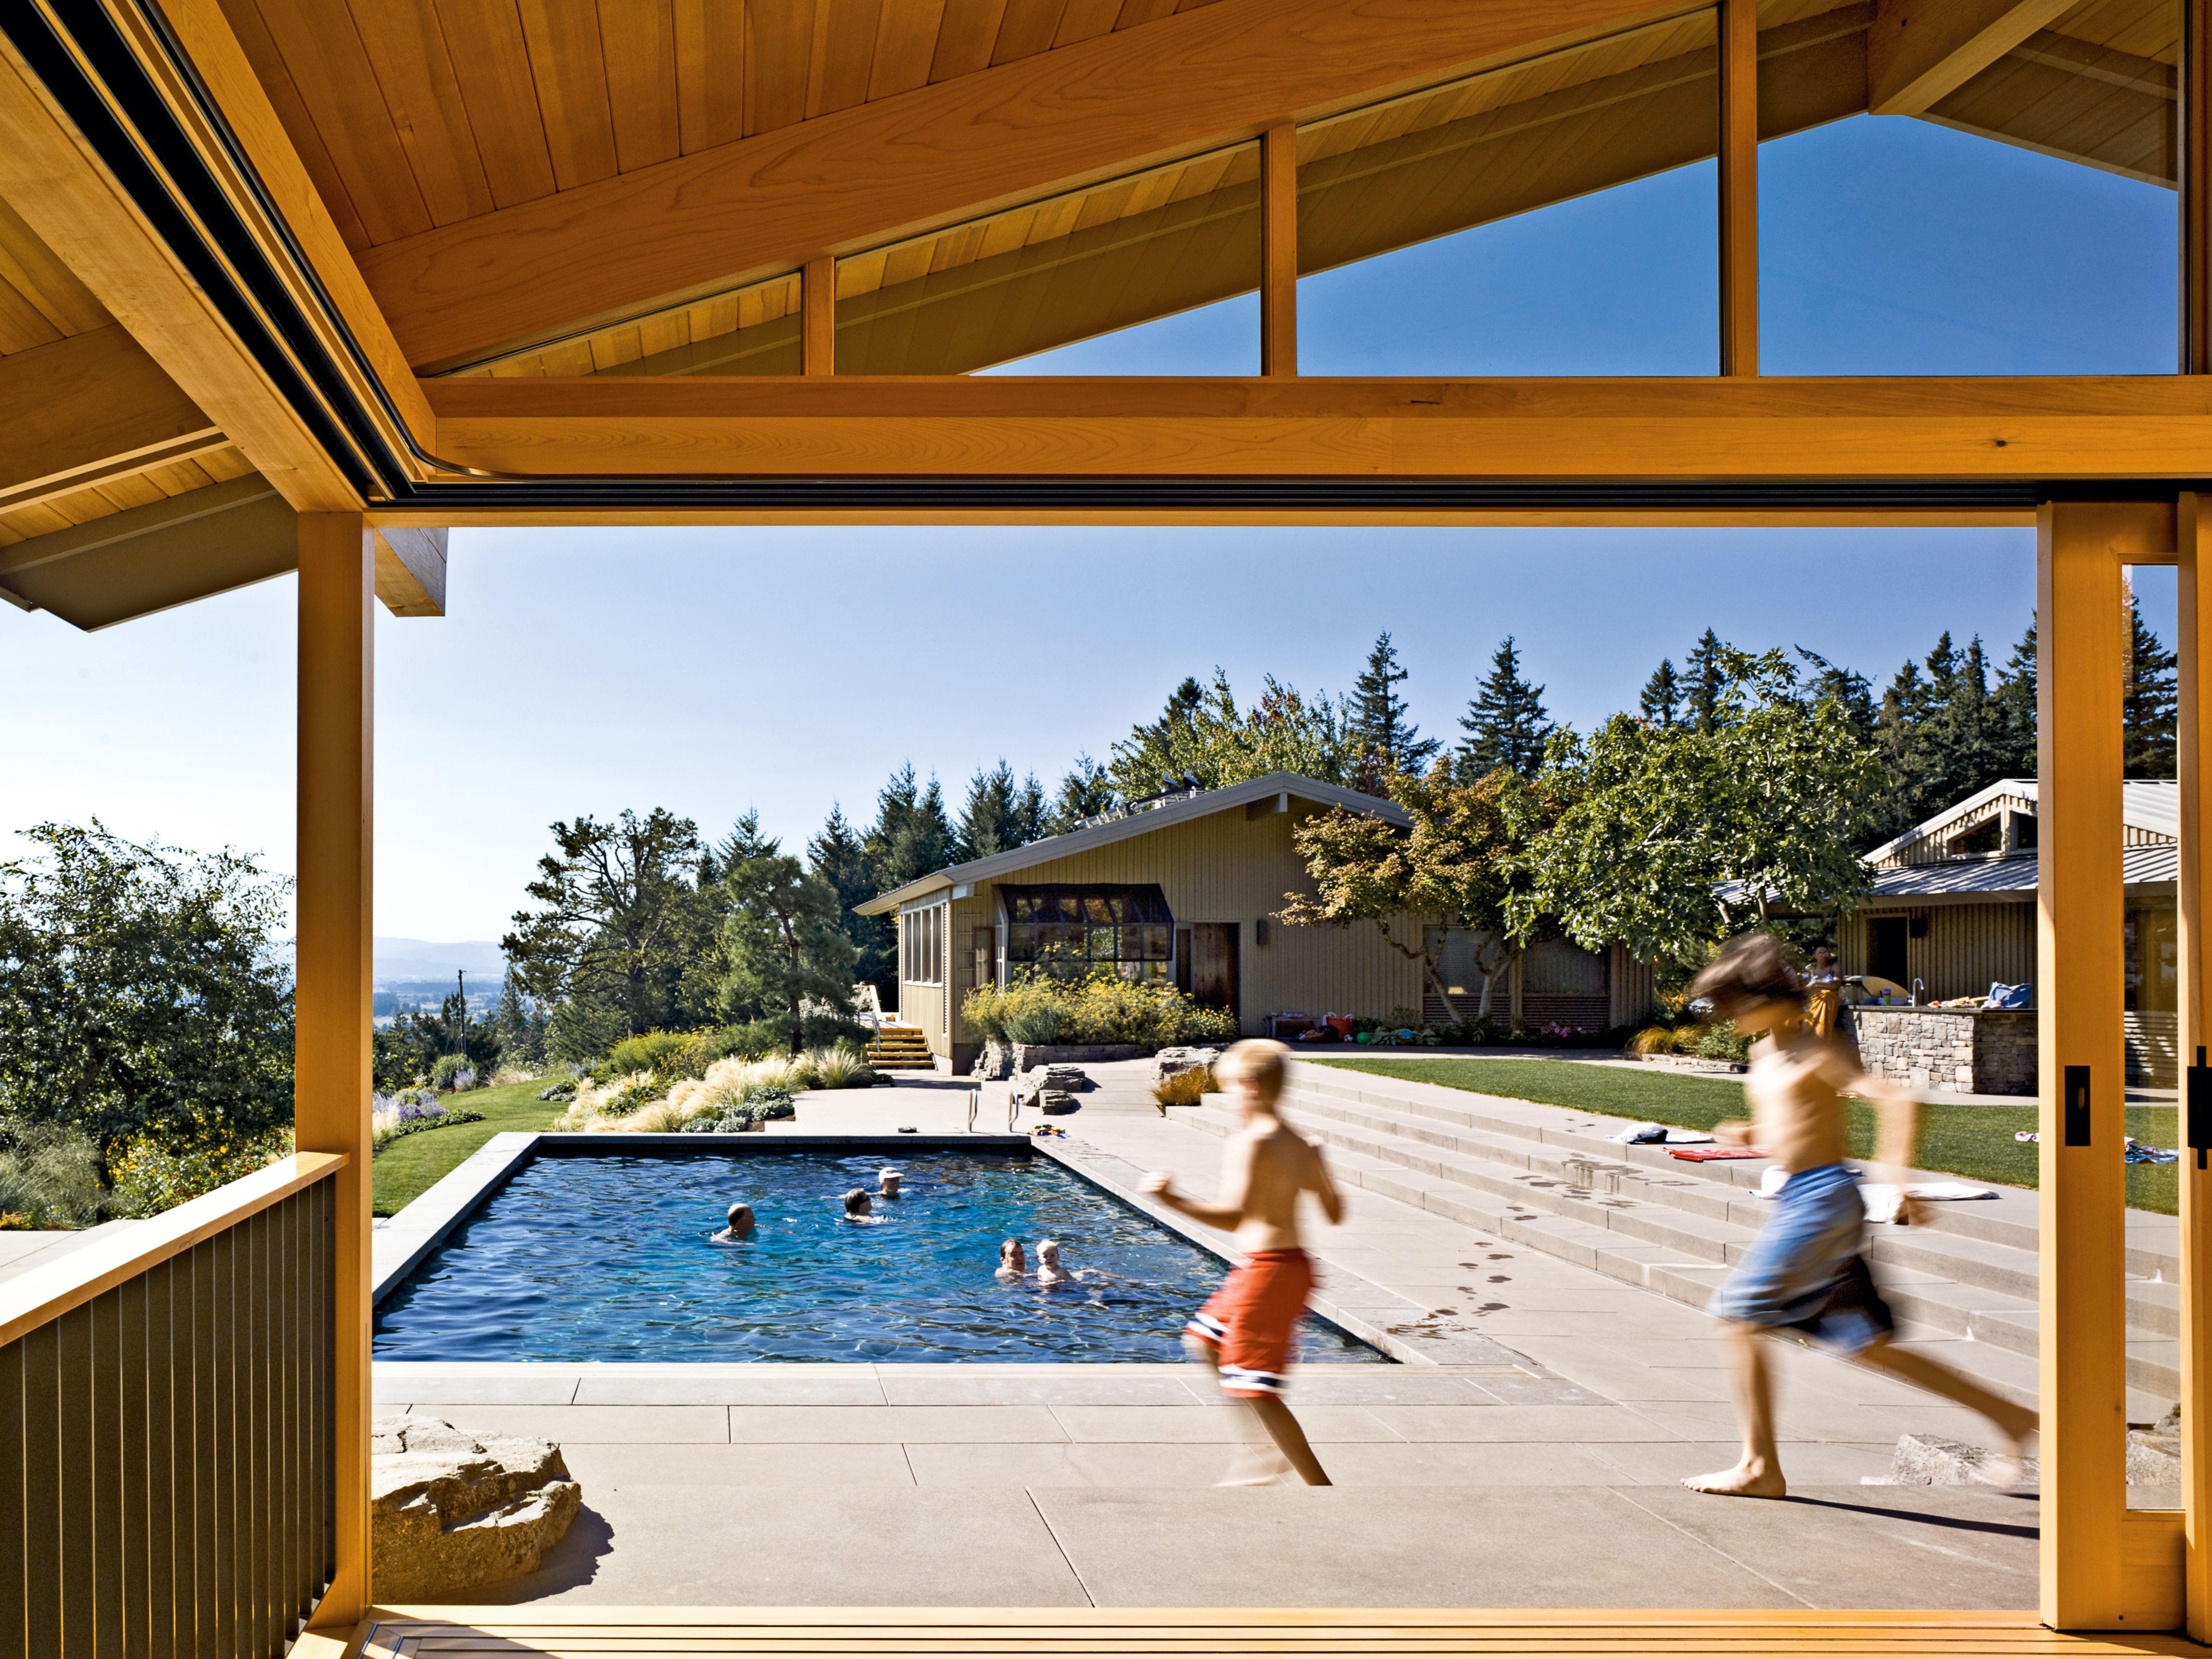 0817 habitat modern pool c9ctpp